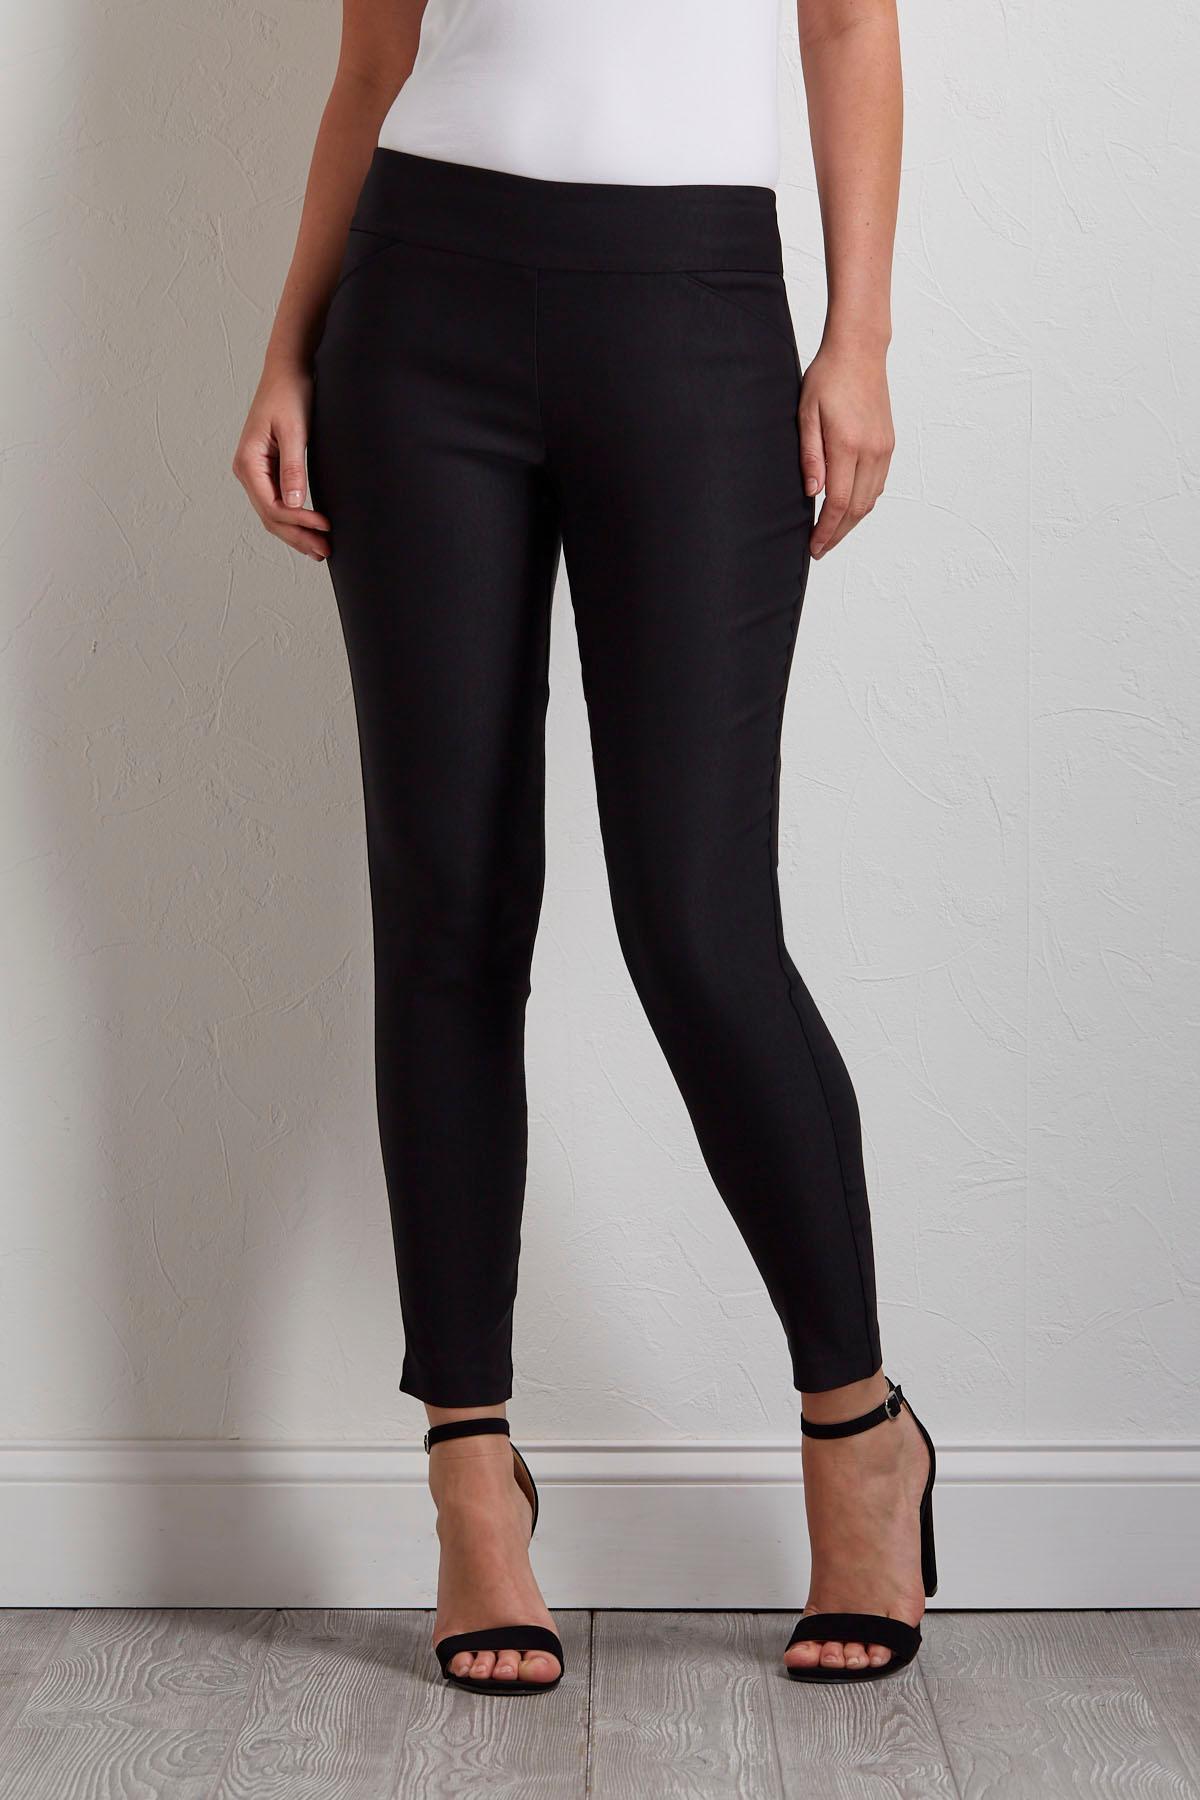 Solid Black Bengaline Pants